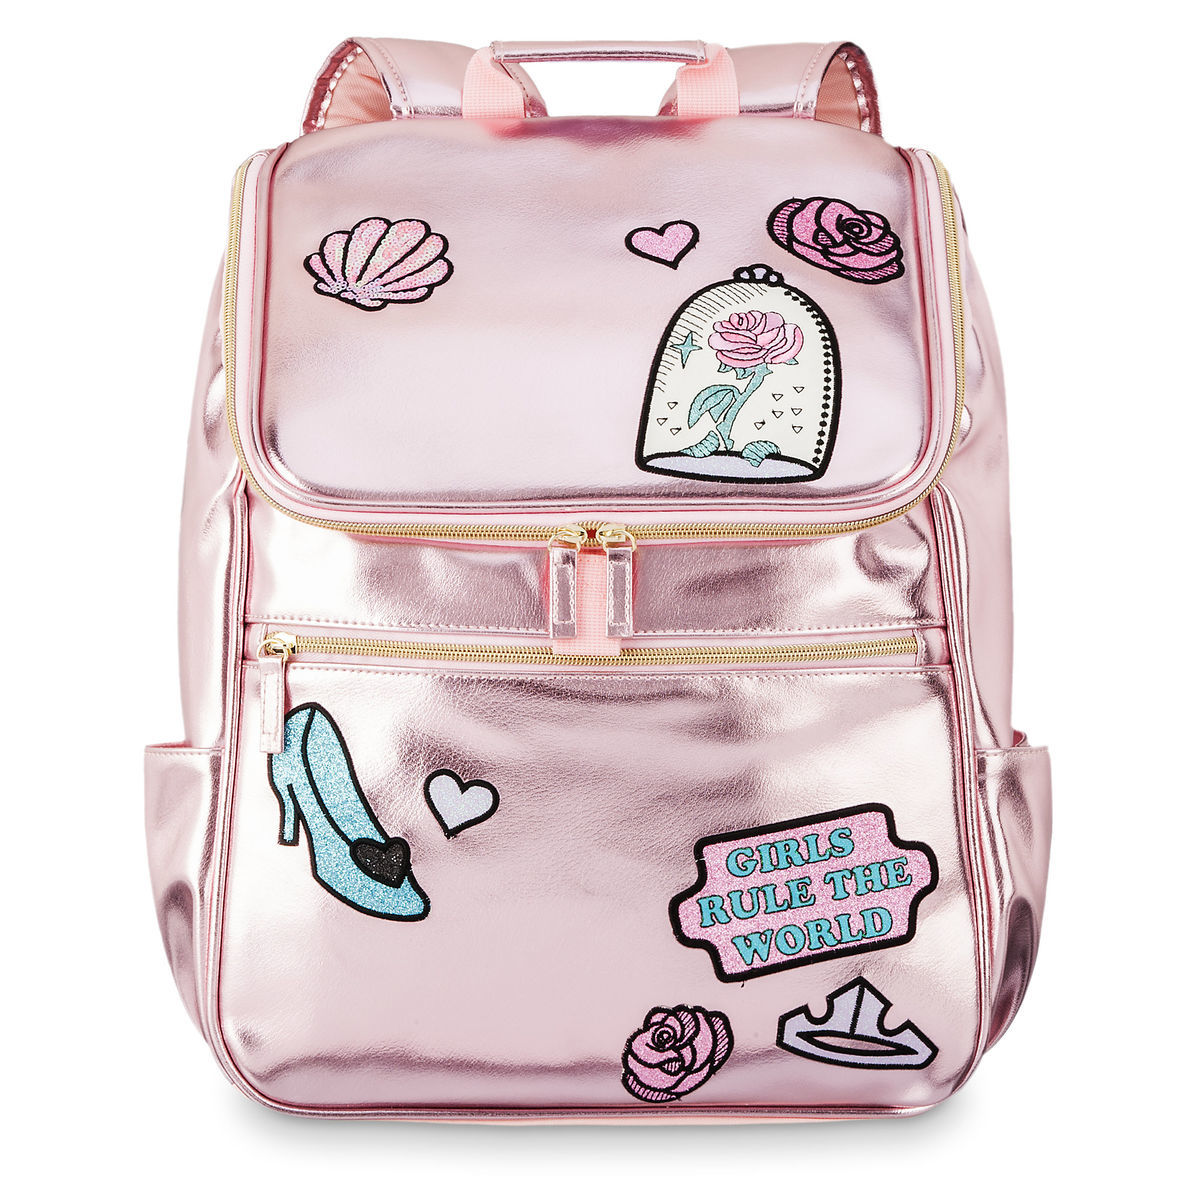 Product Image of Disney Princess Icons Backpack for Kids   1 c7074af050ab6